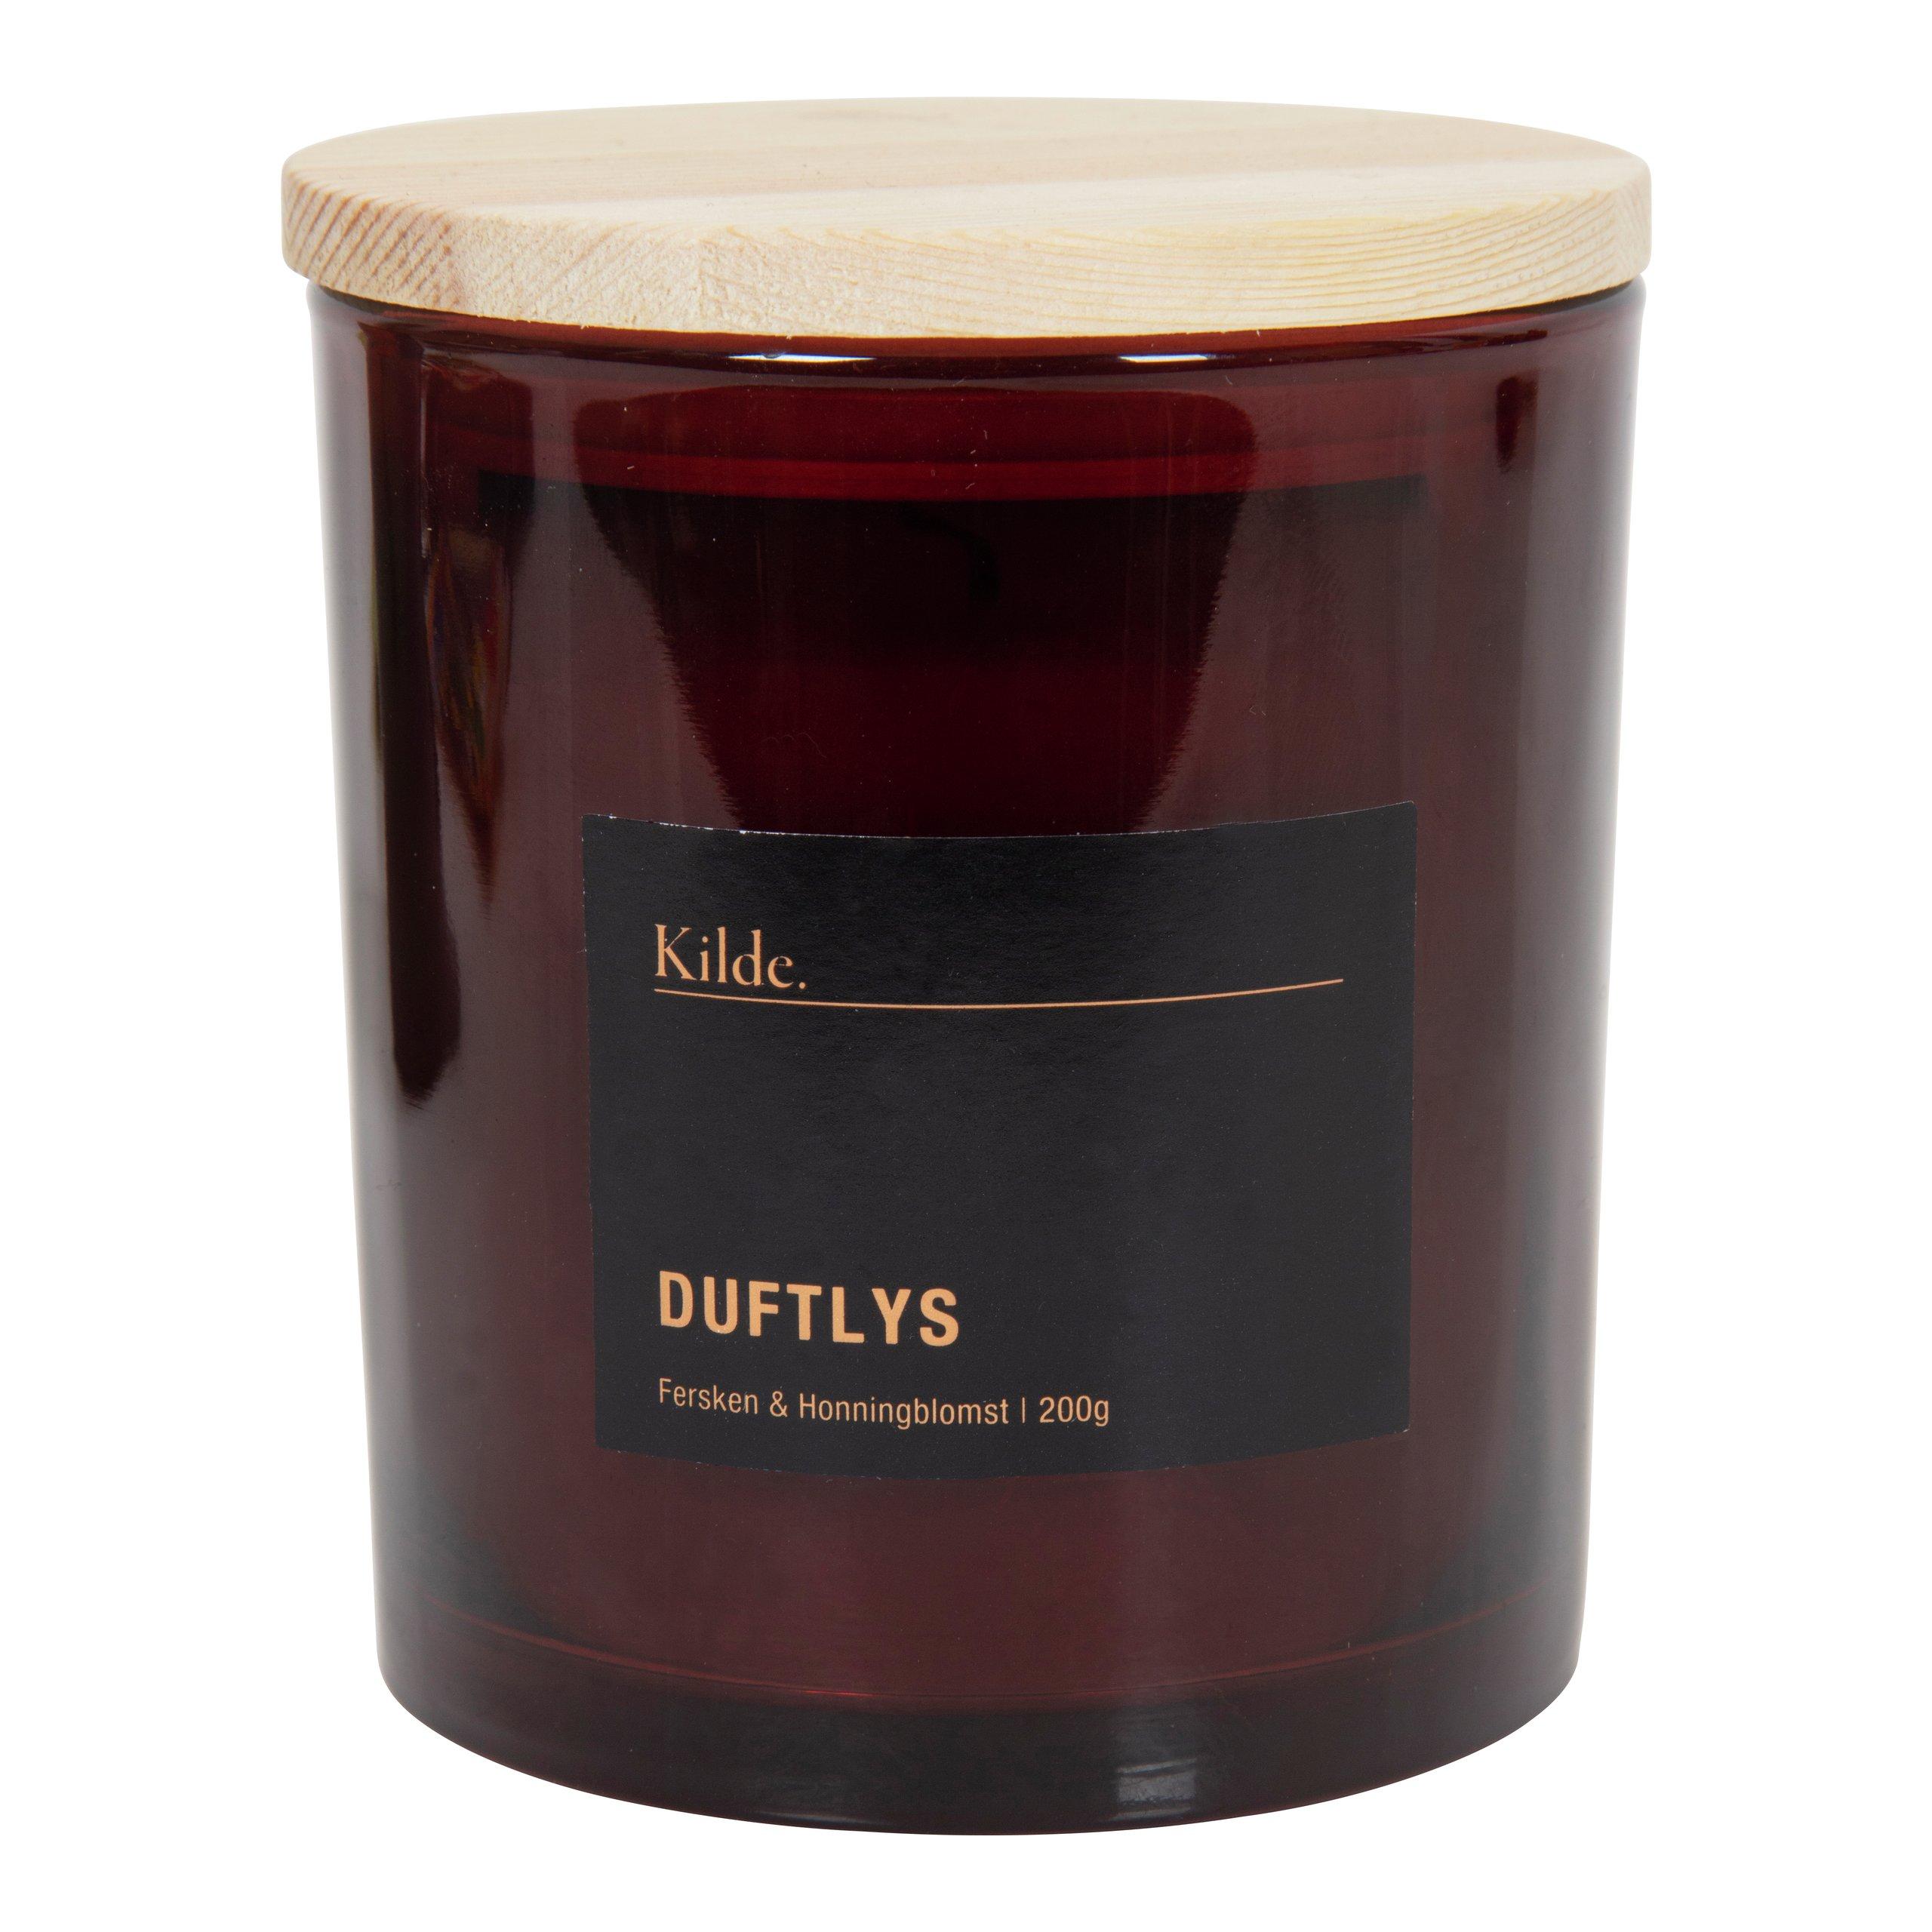 KILDE DUFTLYS FERSKEN & HONNINGBLOMST 200G-104853